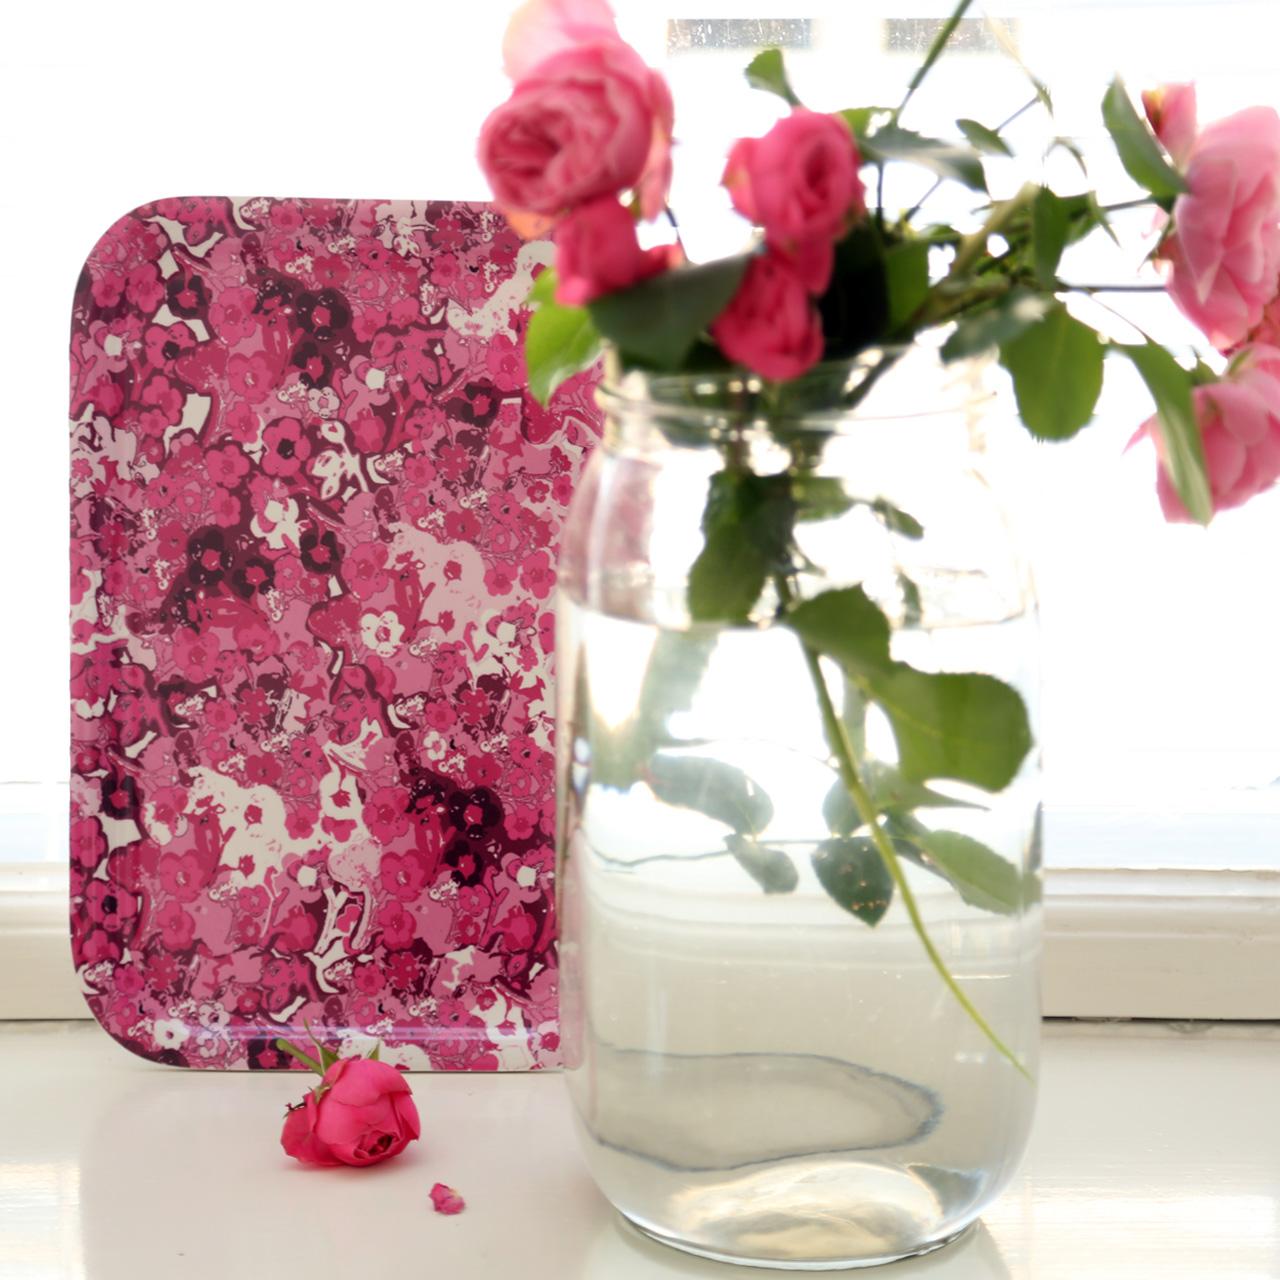 ivana helsinki floral collection